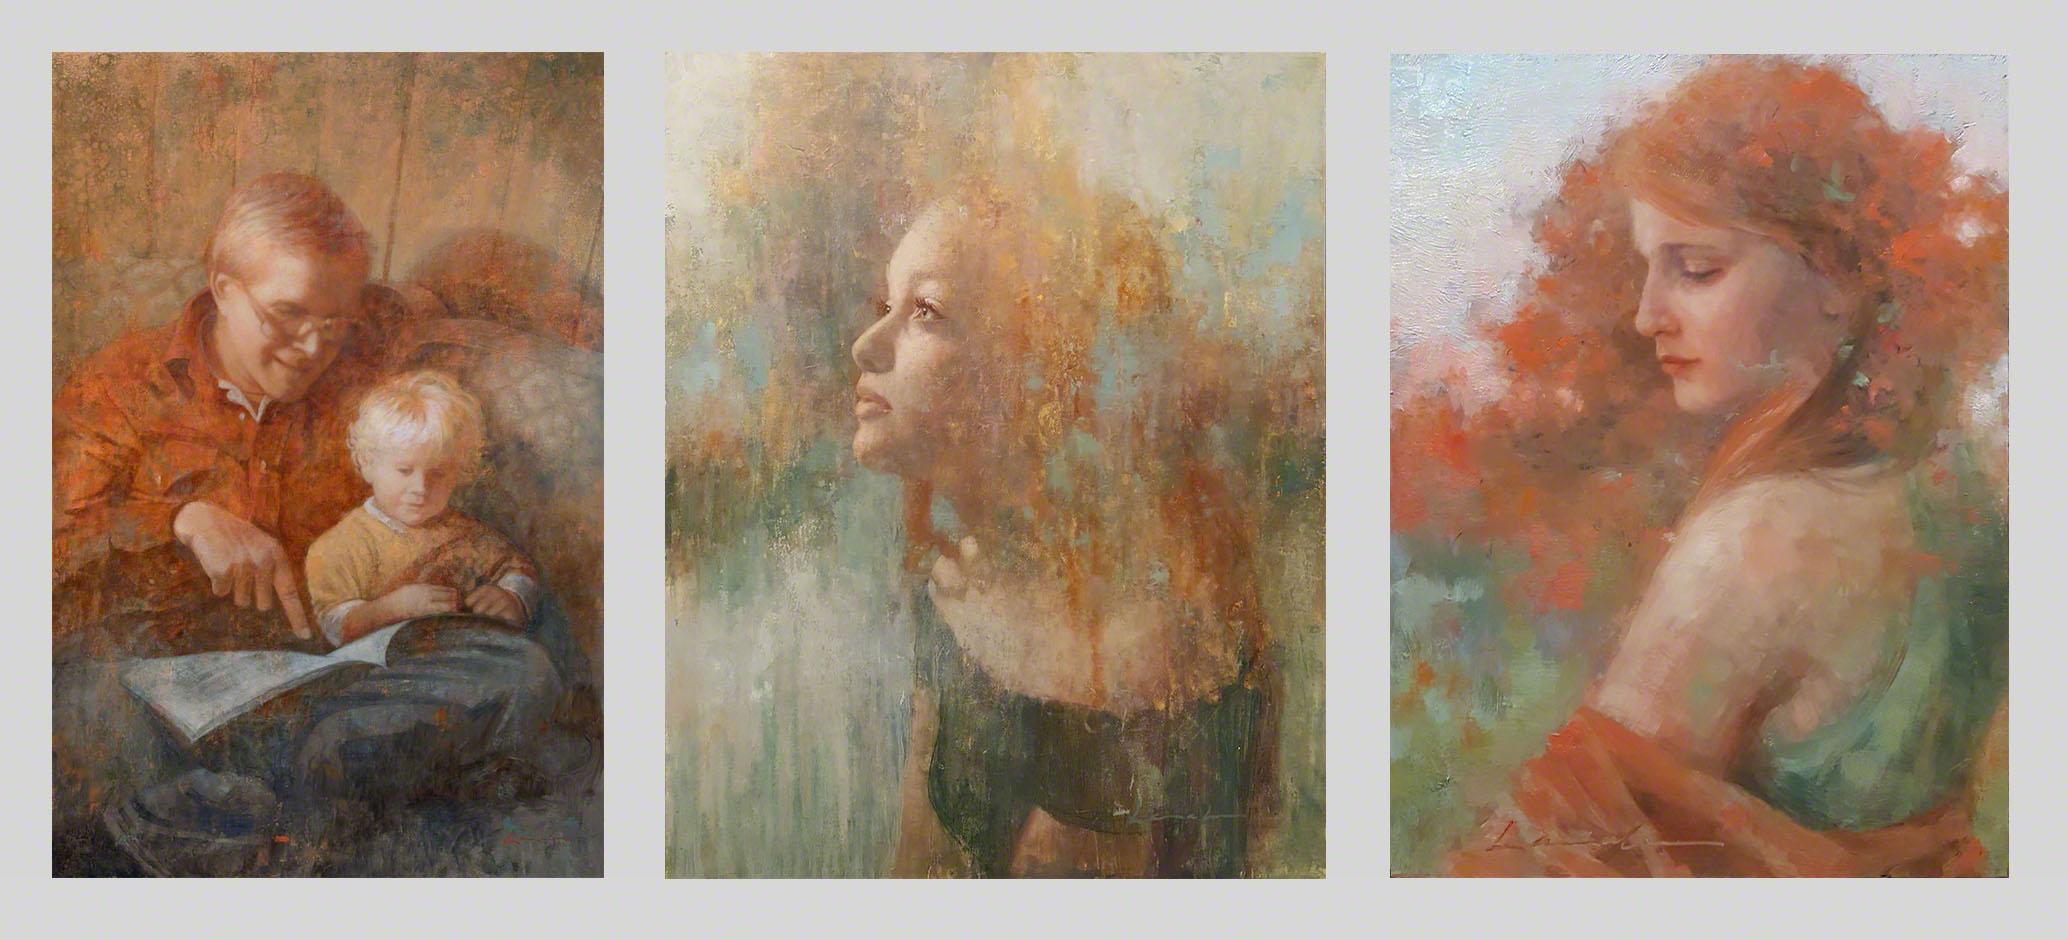 Figurative portraits -artist Lisa Larrabee